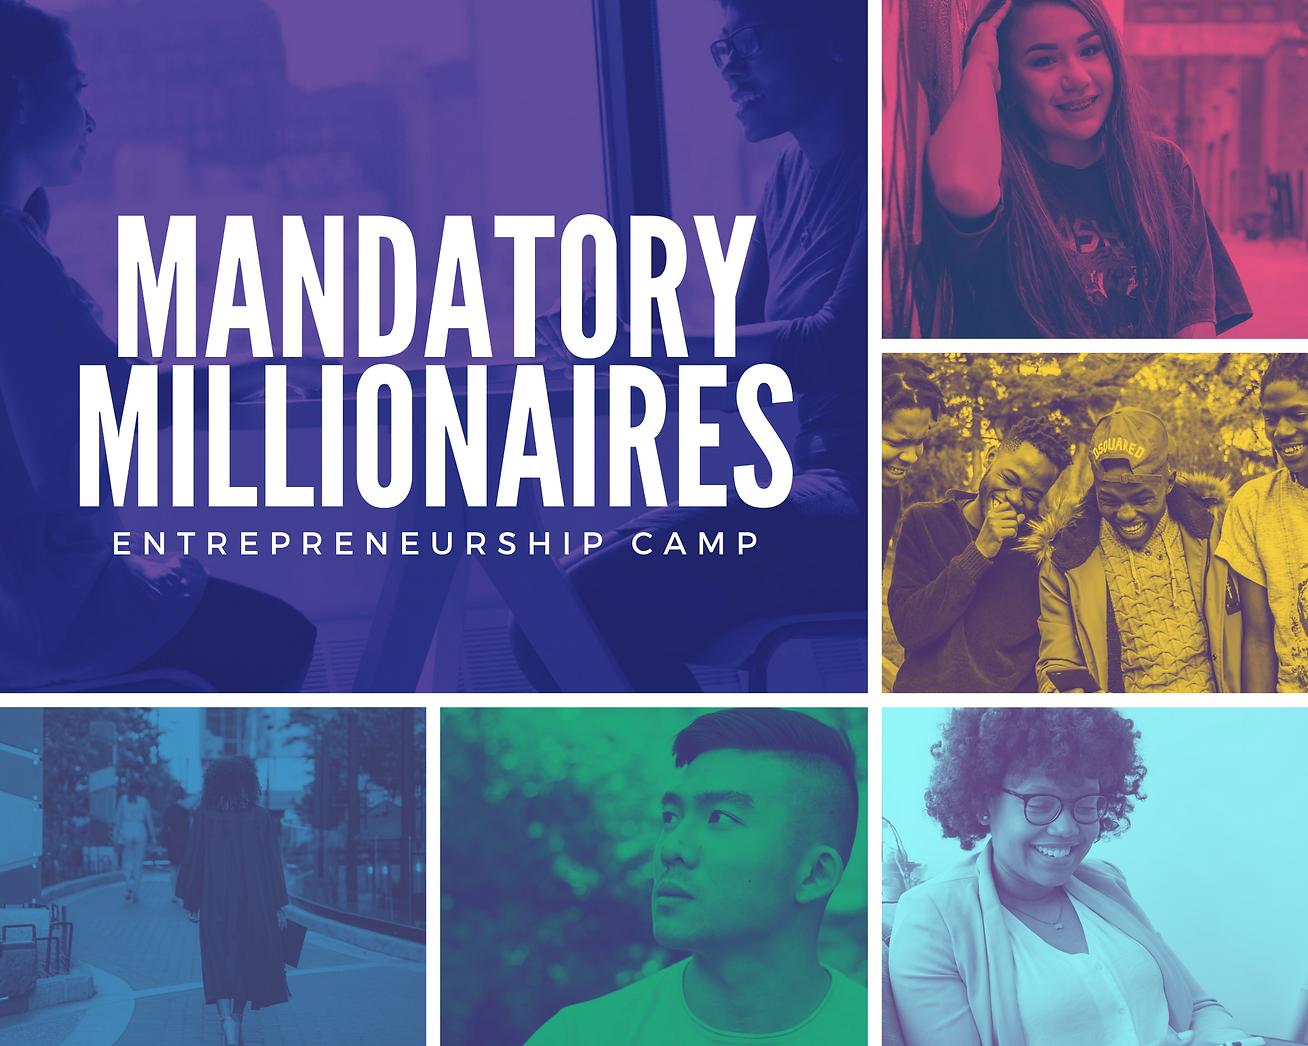 Mandatory Millionaire Program (2).png